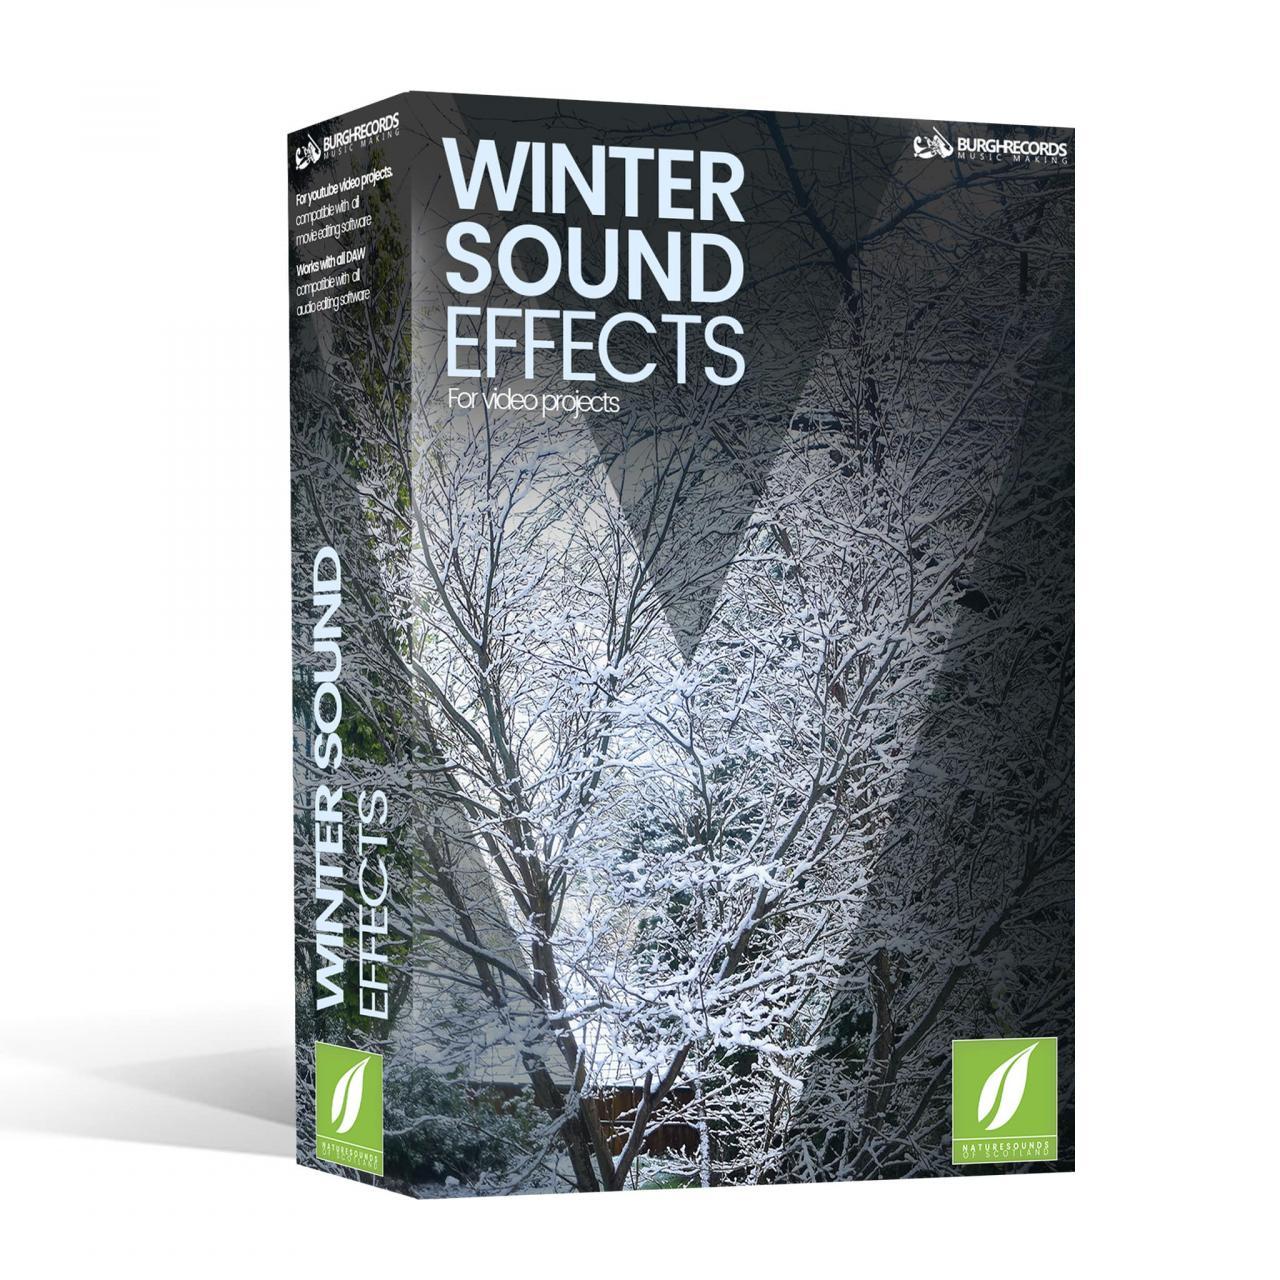 WINTER-BOX-COVER-min.jpg